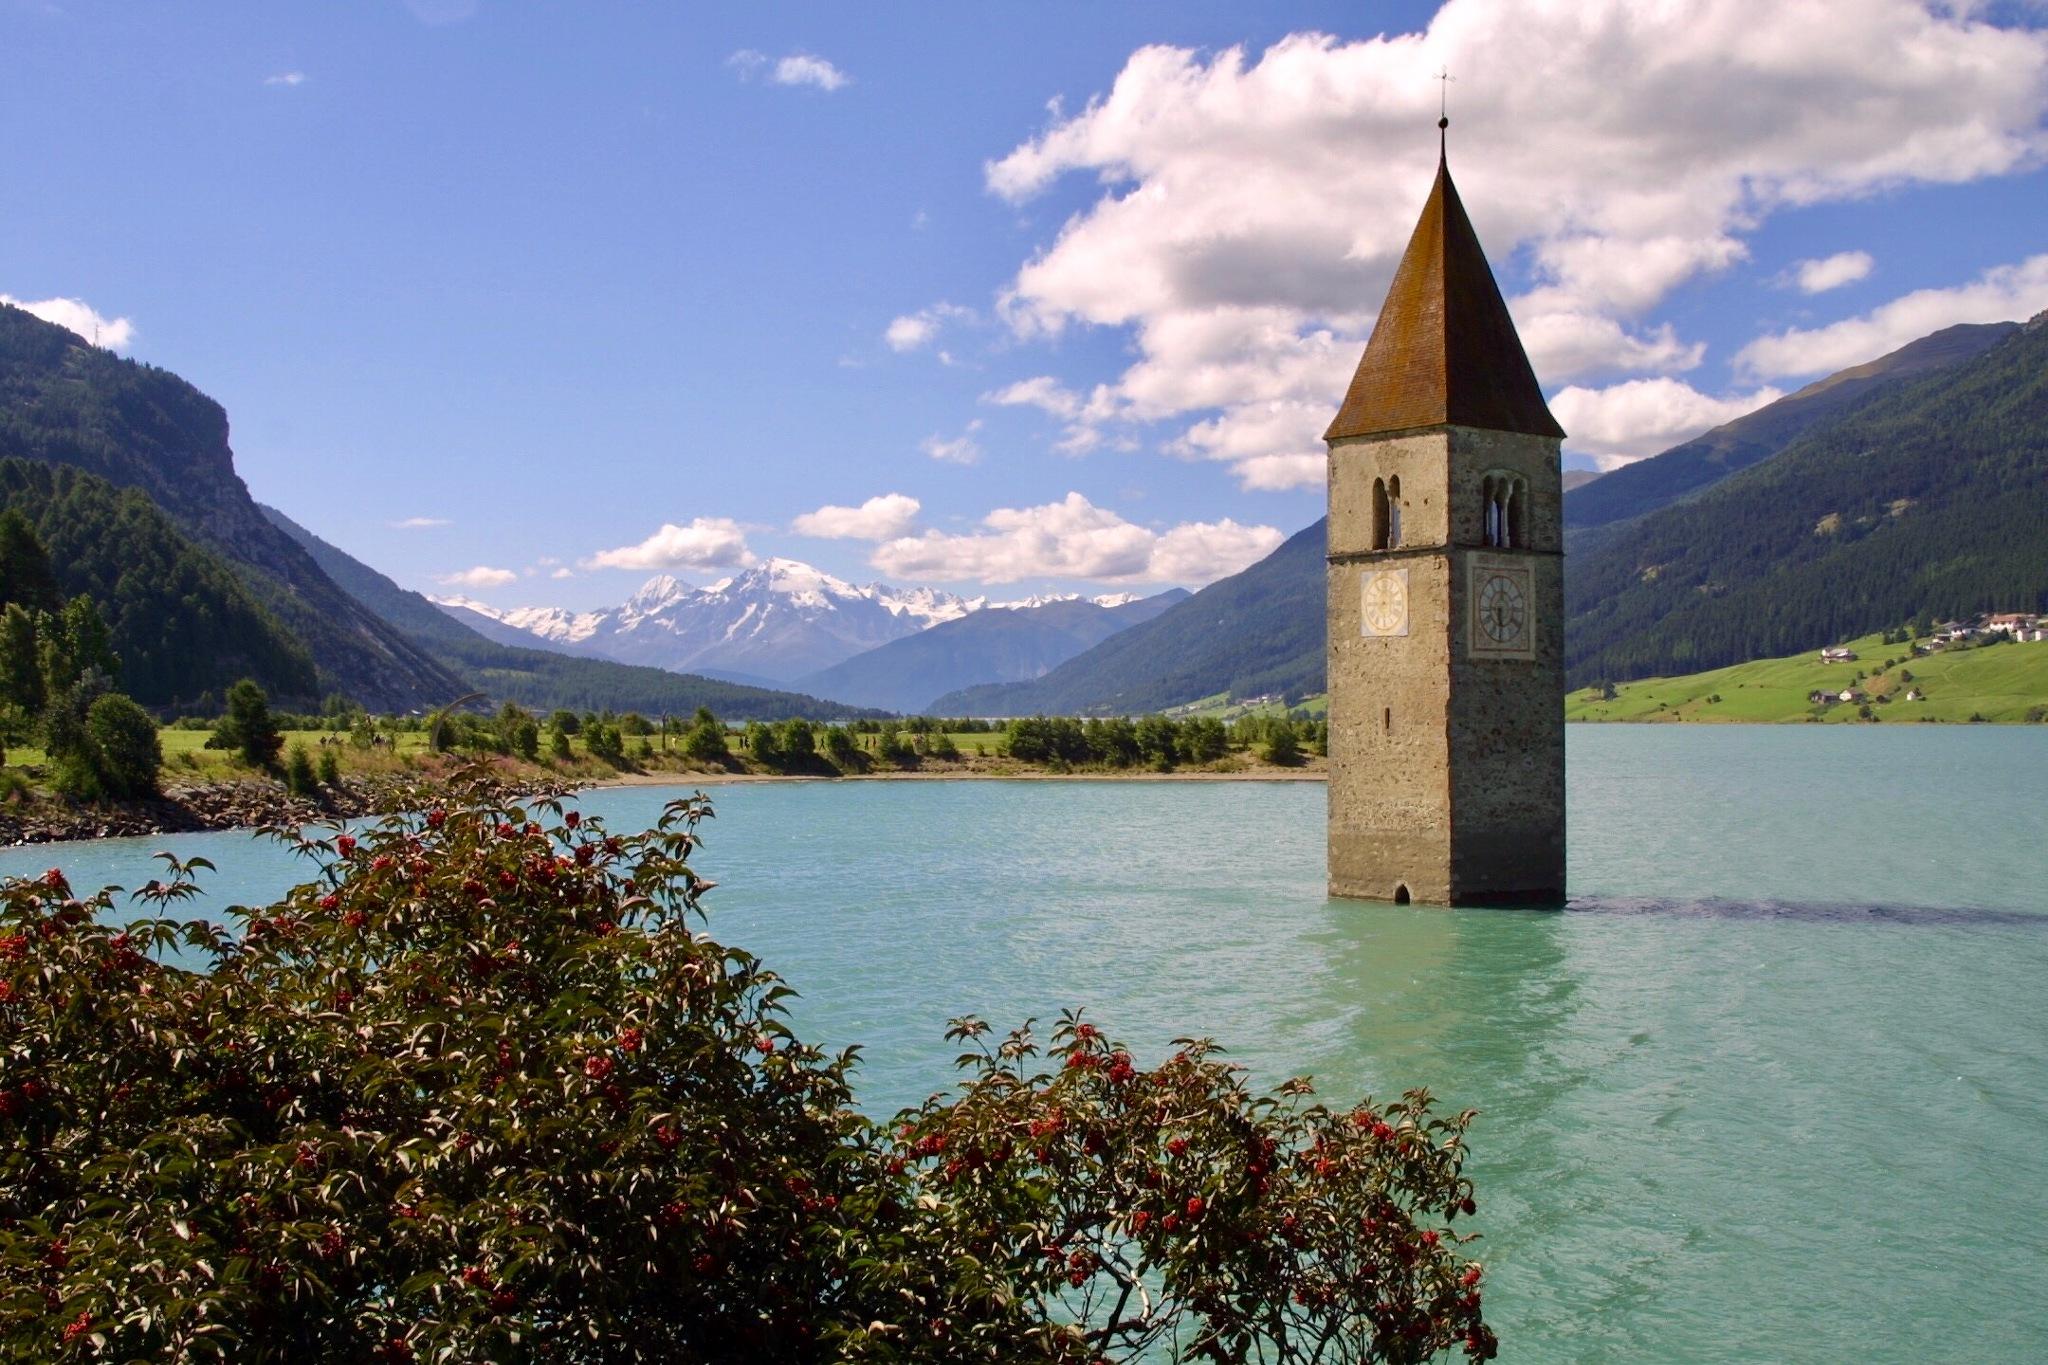 The tower on the lake by Francisco Sá da Bandeira